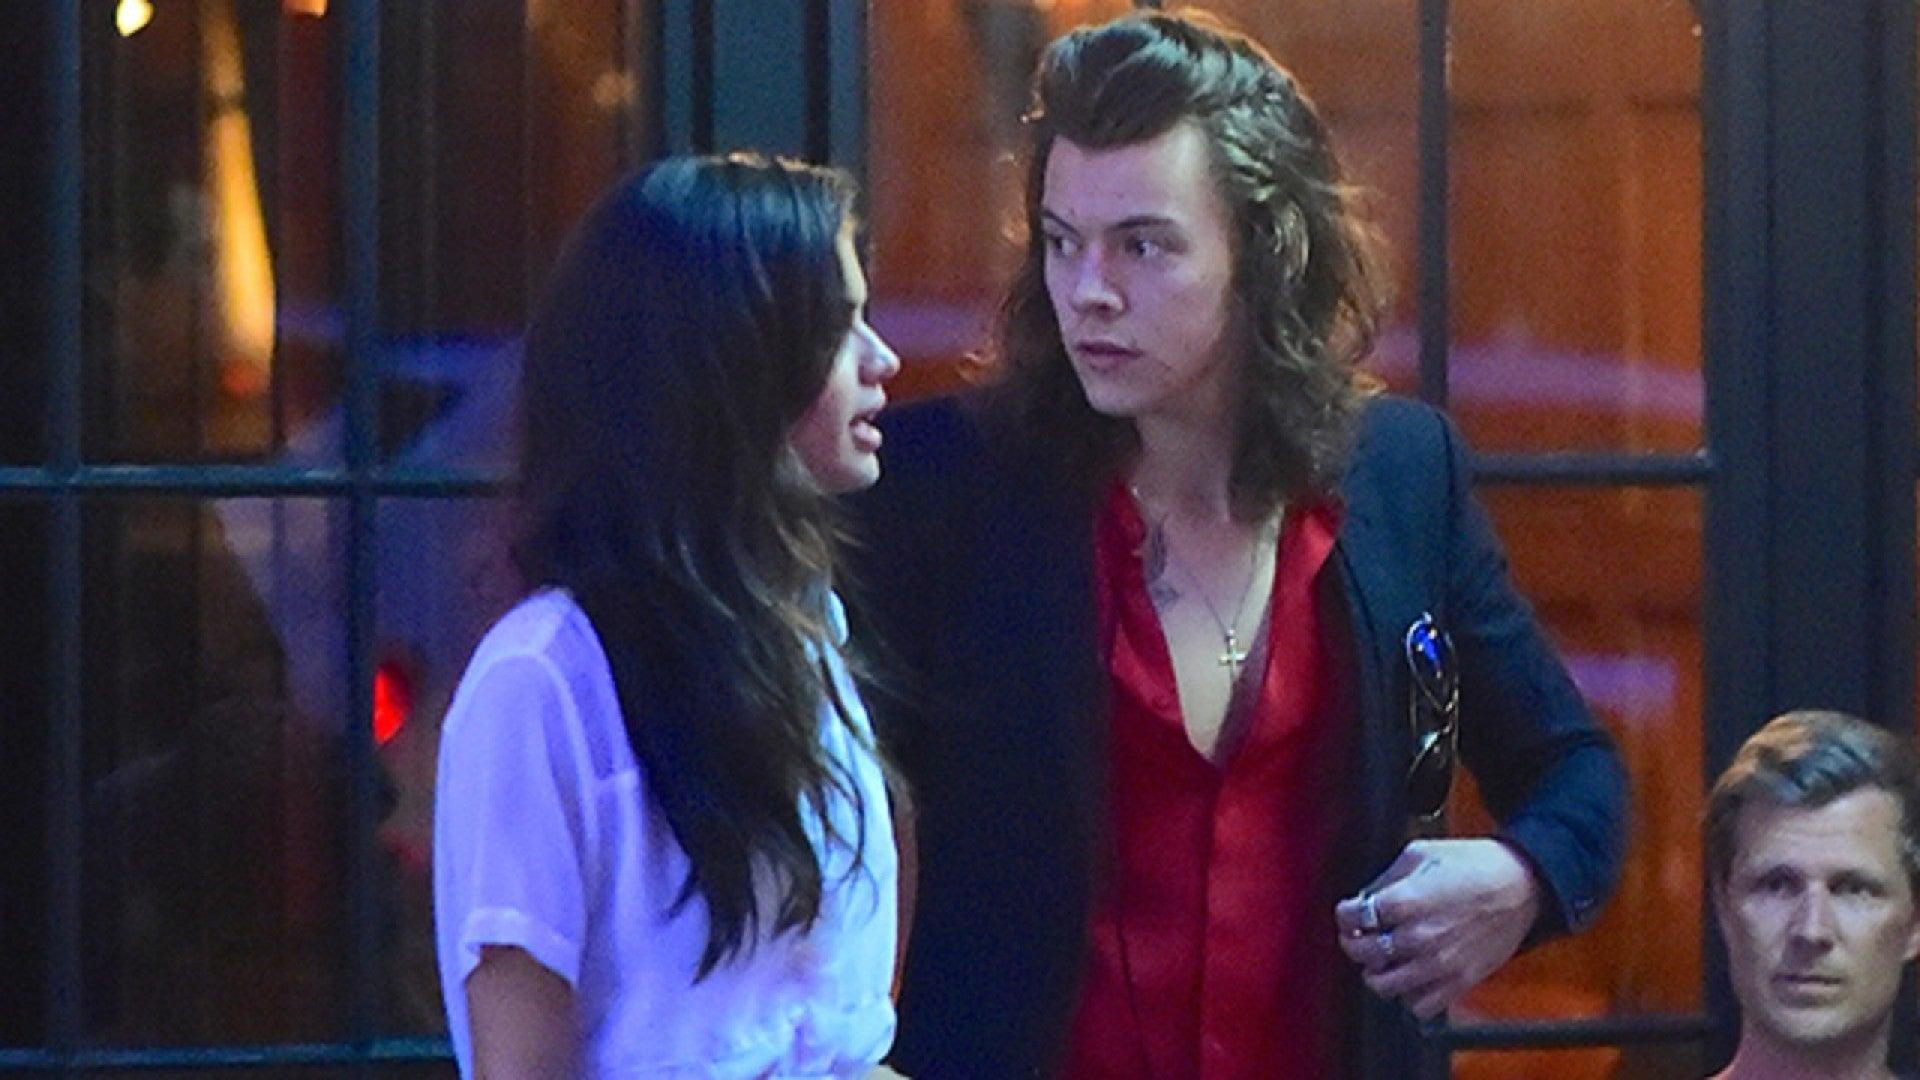 Harry dating victorias secret model